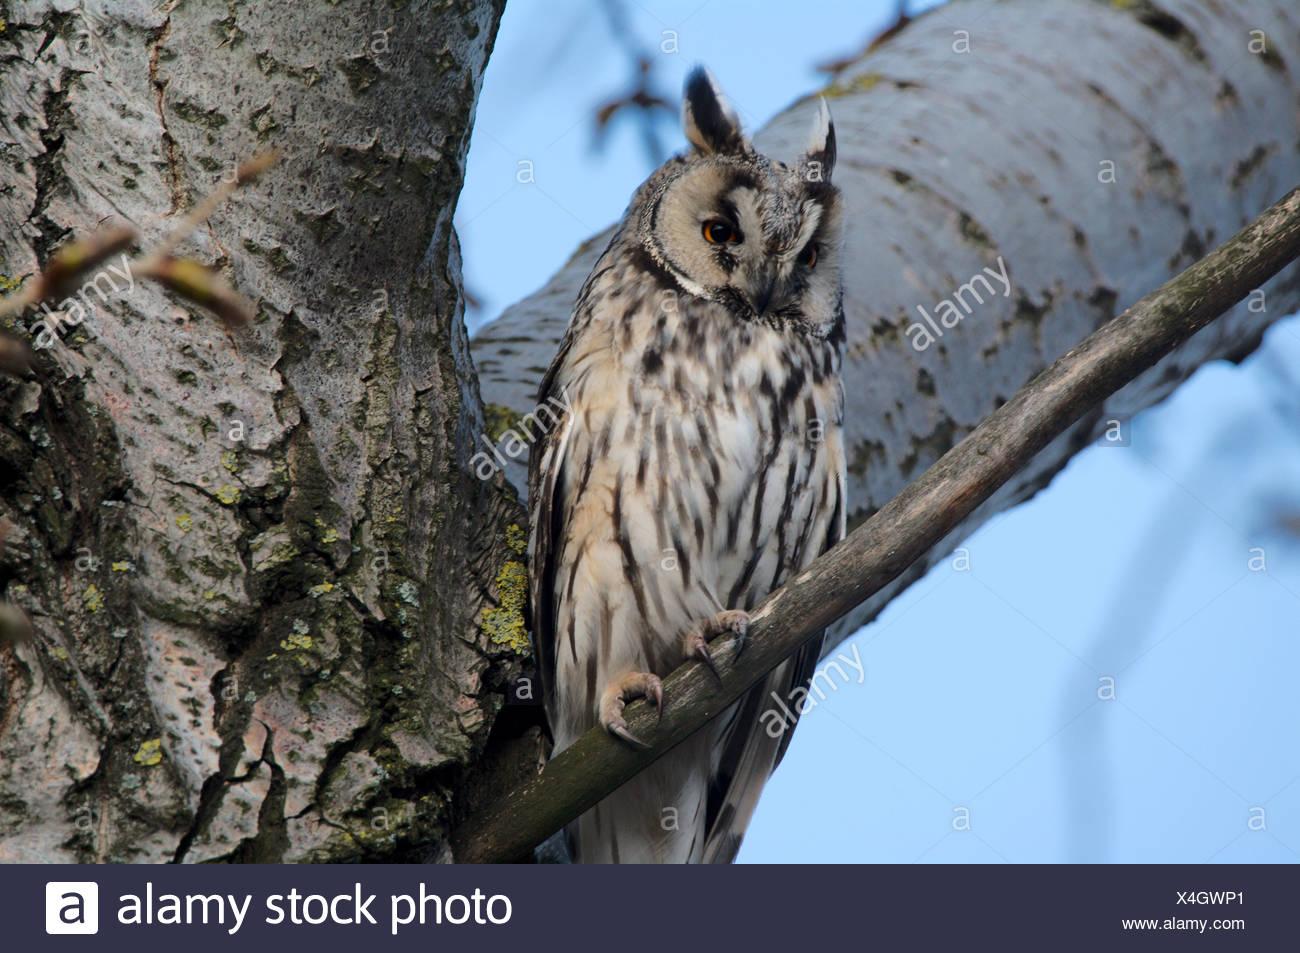 Austria, Europe, Burgenland, bird, birds songbird, owl, long-eared owl, forest, young birds, tree - Stock Image